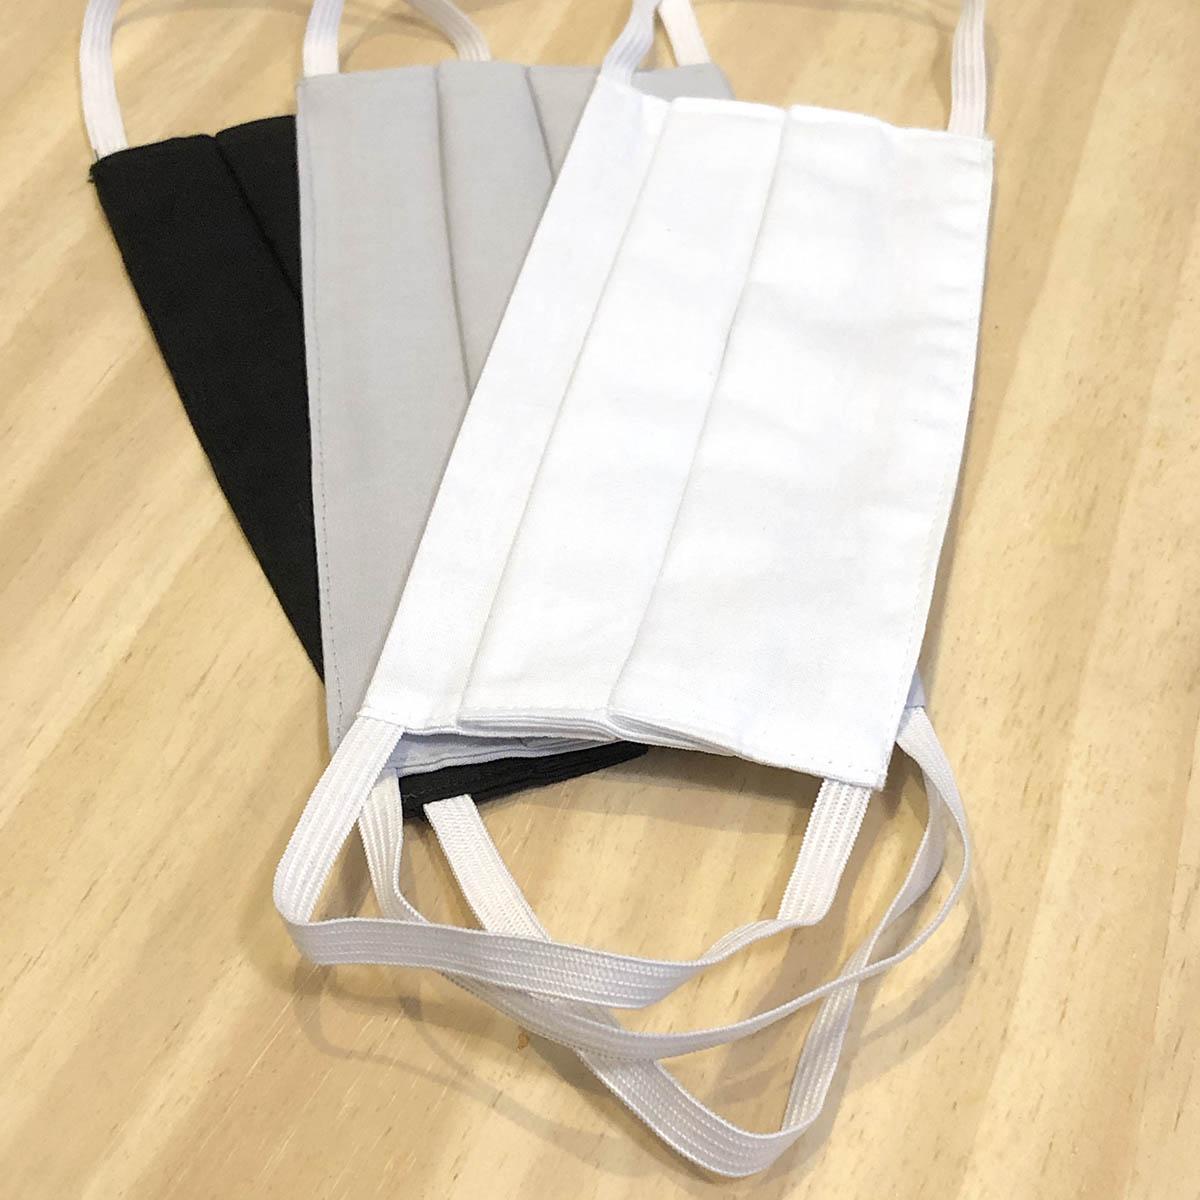 Kit 3 Máscaras Protetoras Preta, Cinza E Branca Adulto